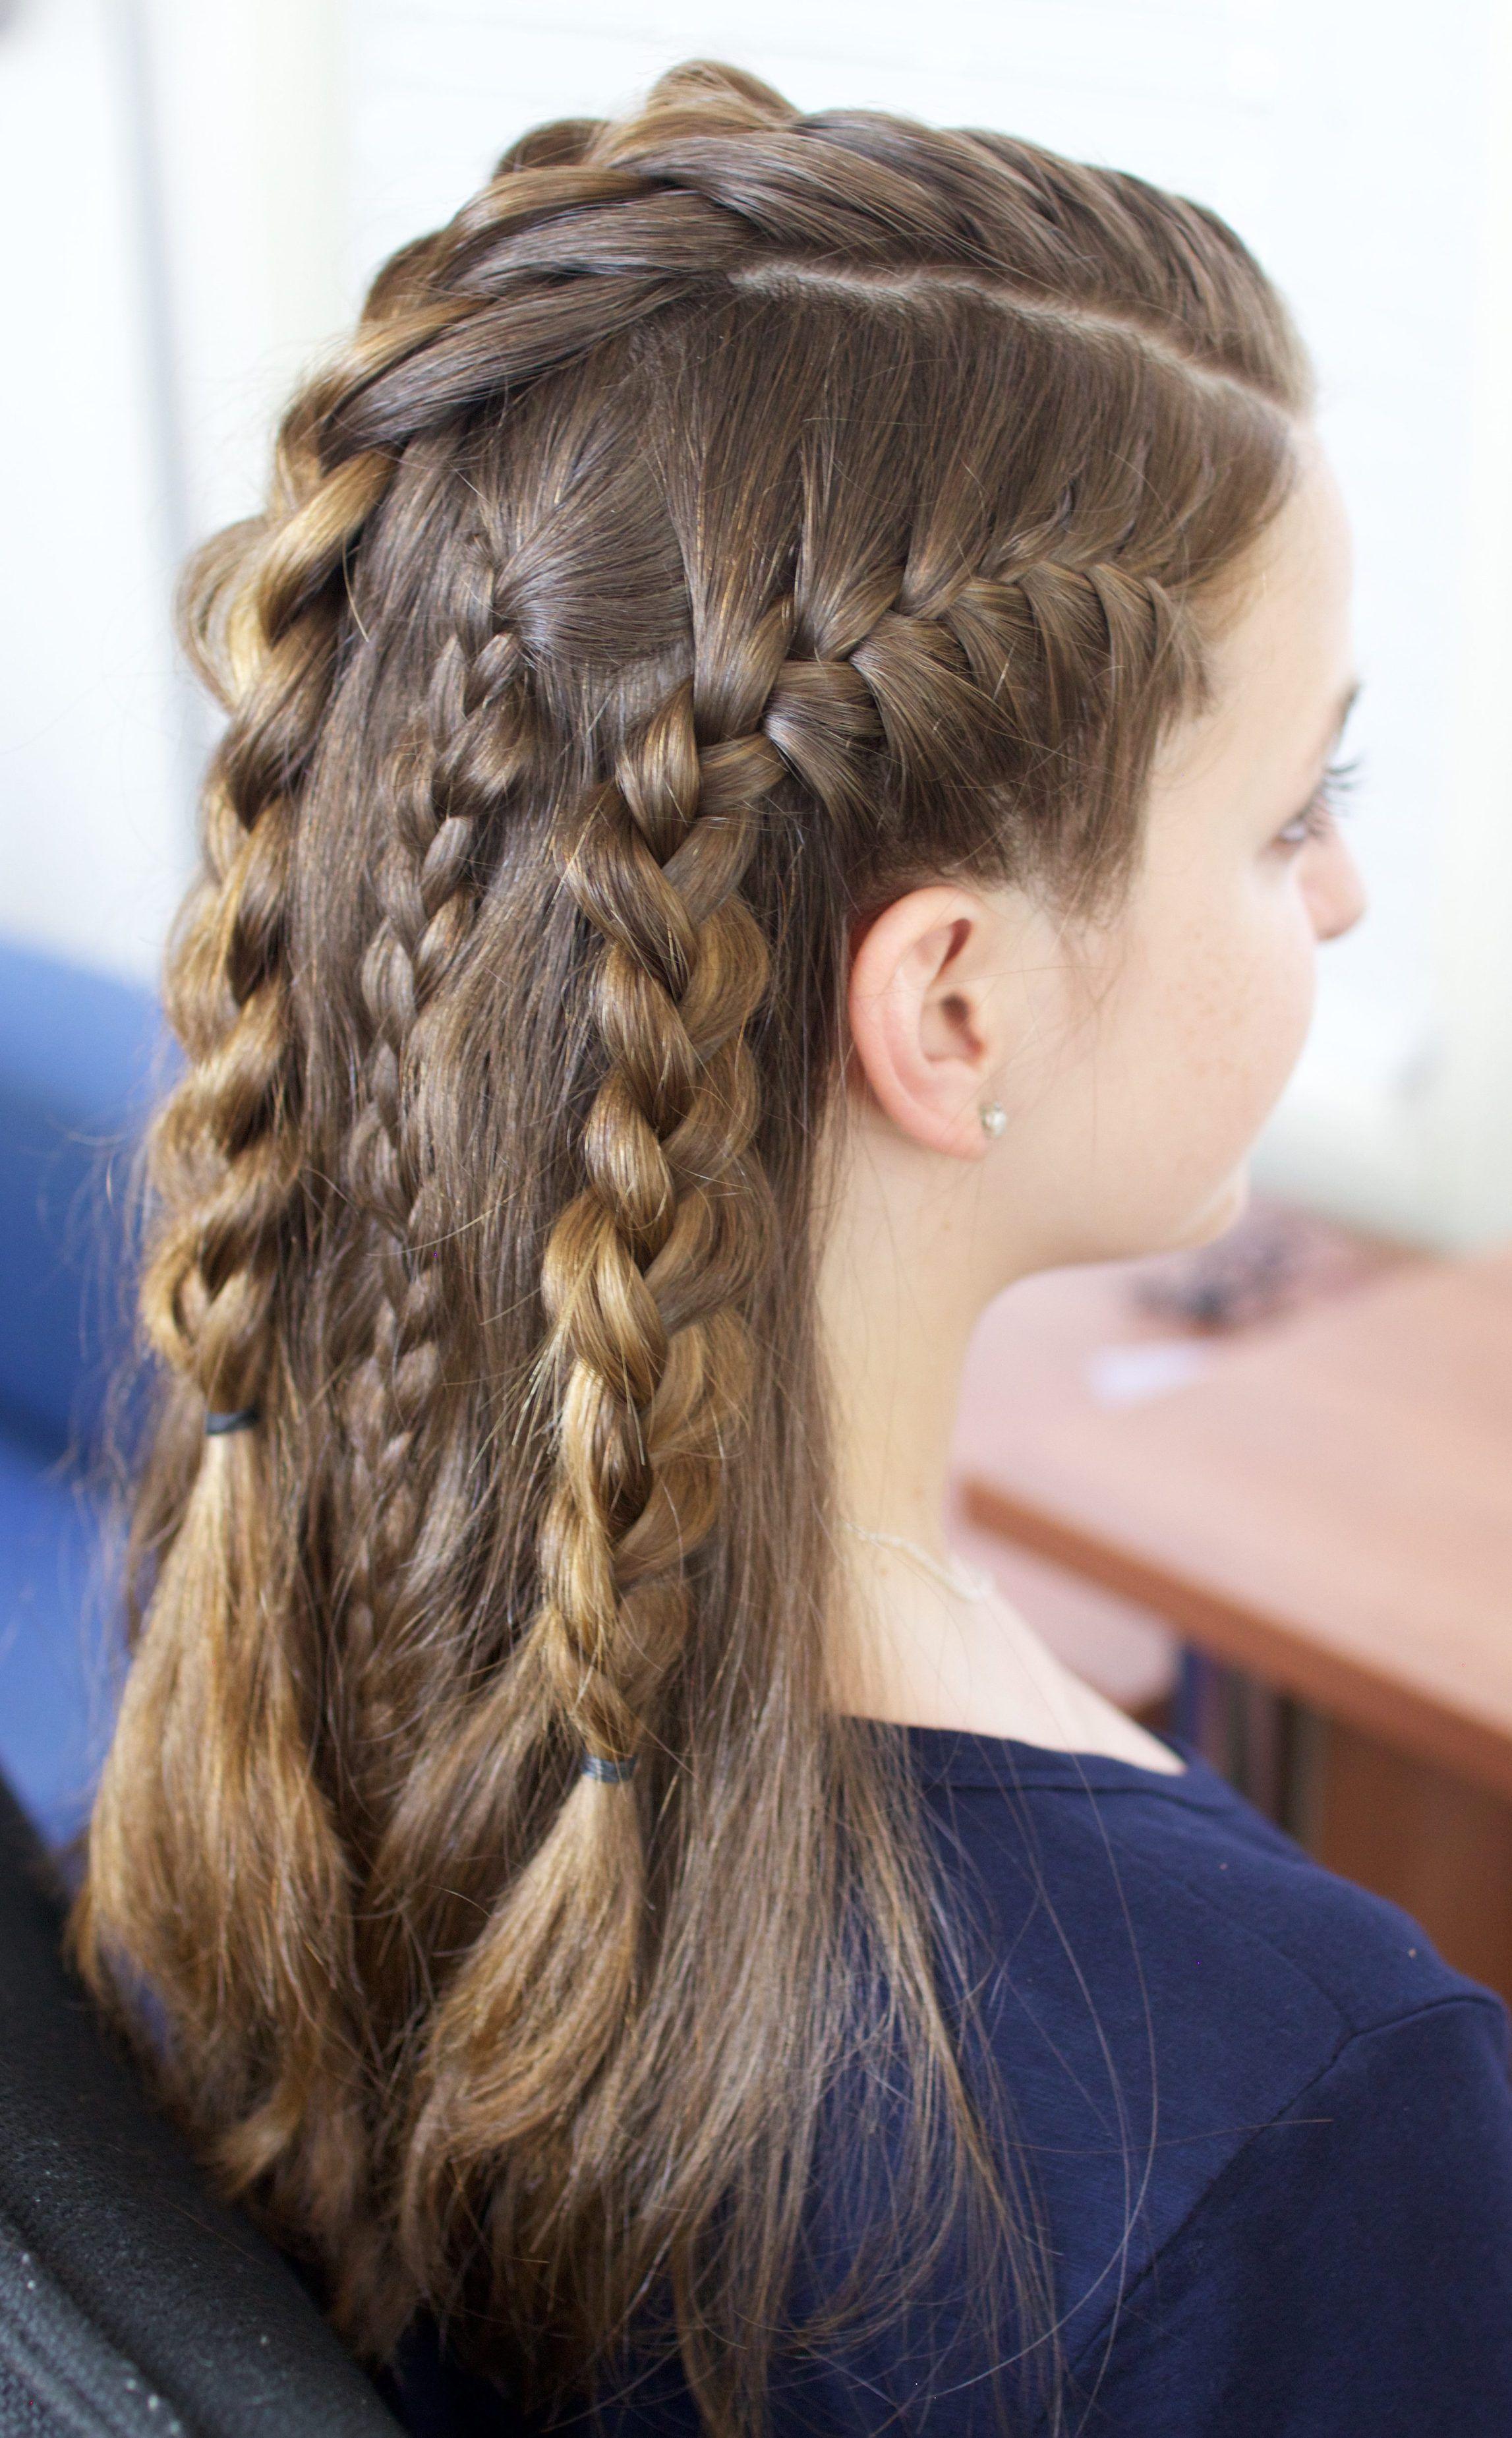 Braided viking style worn by sigurd vikings pinterest braided viking style worn by sigurd ccuart Images